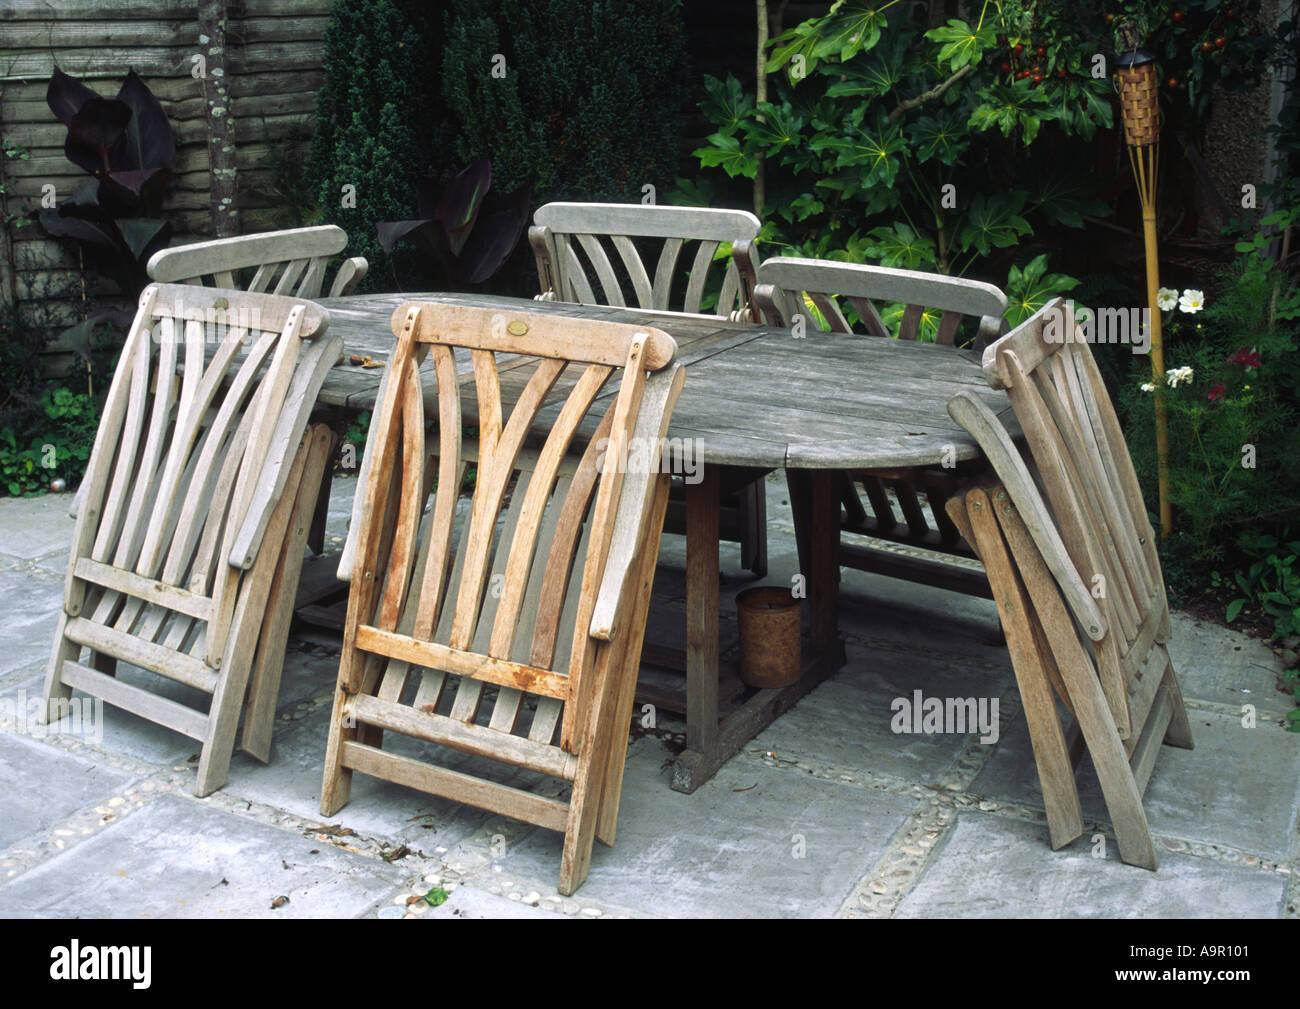 Patio furniture for alfresco dining